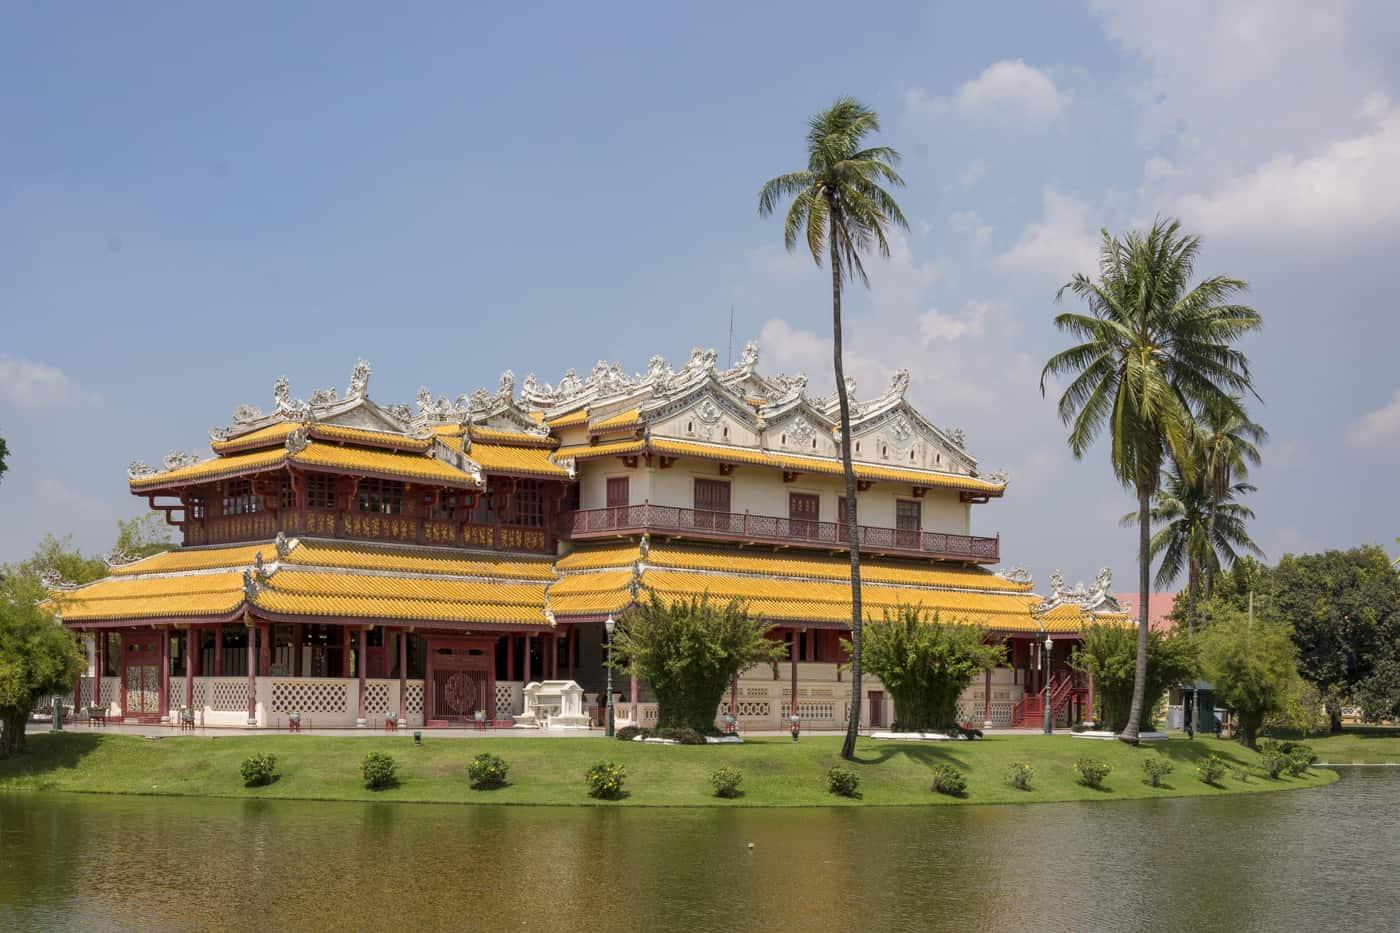 Phra Thinang Wehart Chamrun im Sommerpalast der Könige Bang Pa-In